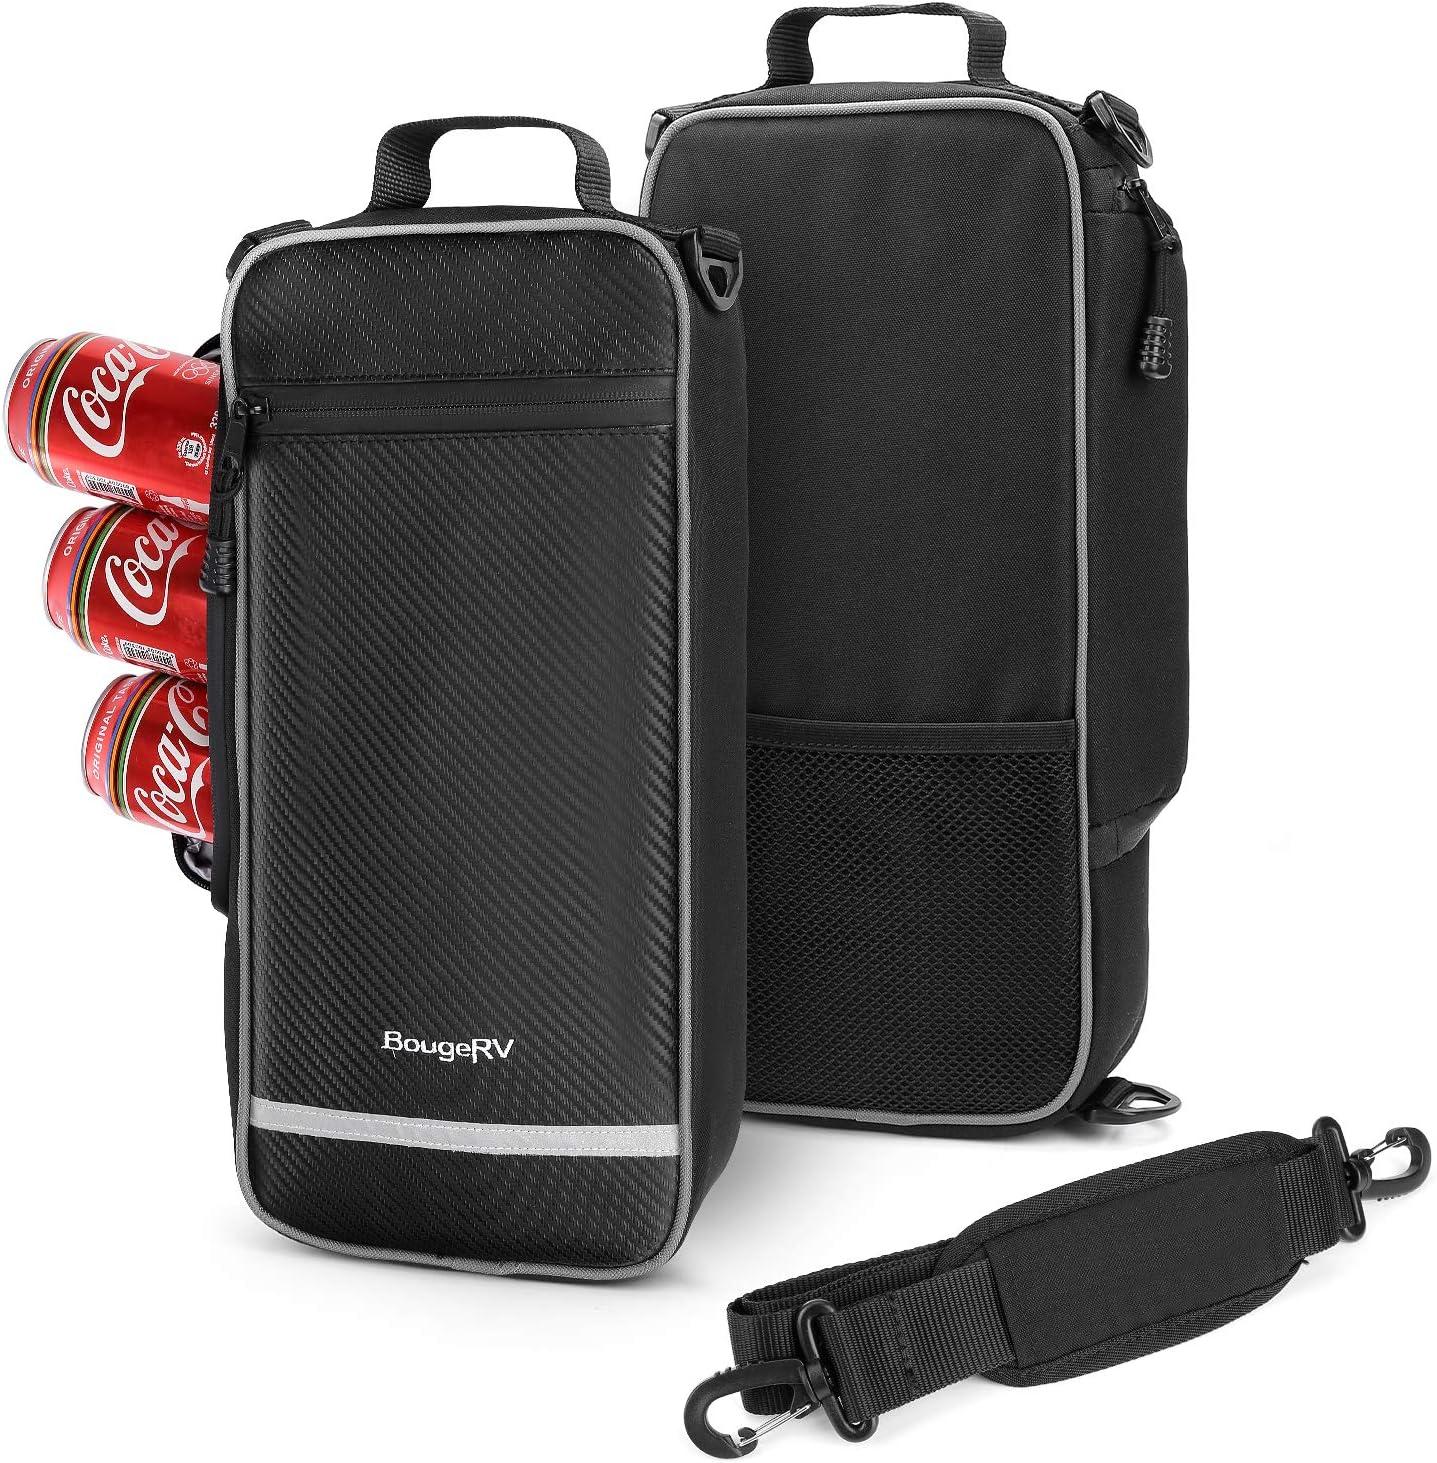 BougeRV Golf Cooler Bag, Soft Side Insulated Cooler, 6 Can or 2 Bottle of Wine Capacity, Built-in Bottle Opener,1 Pack